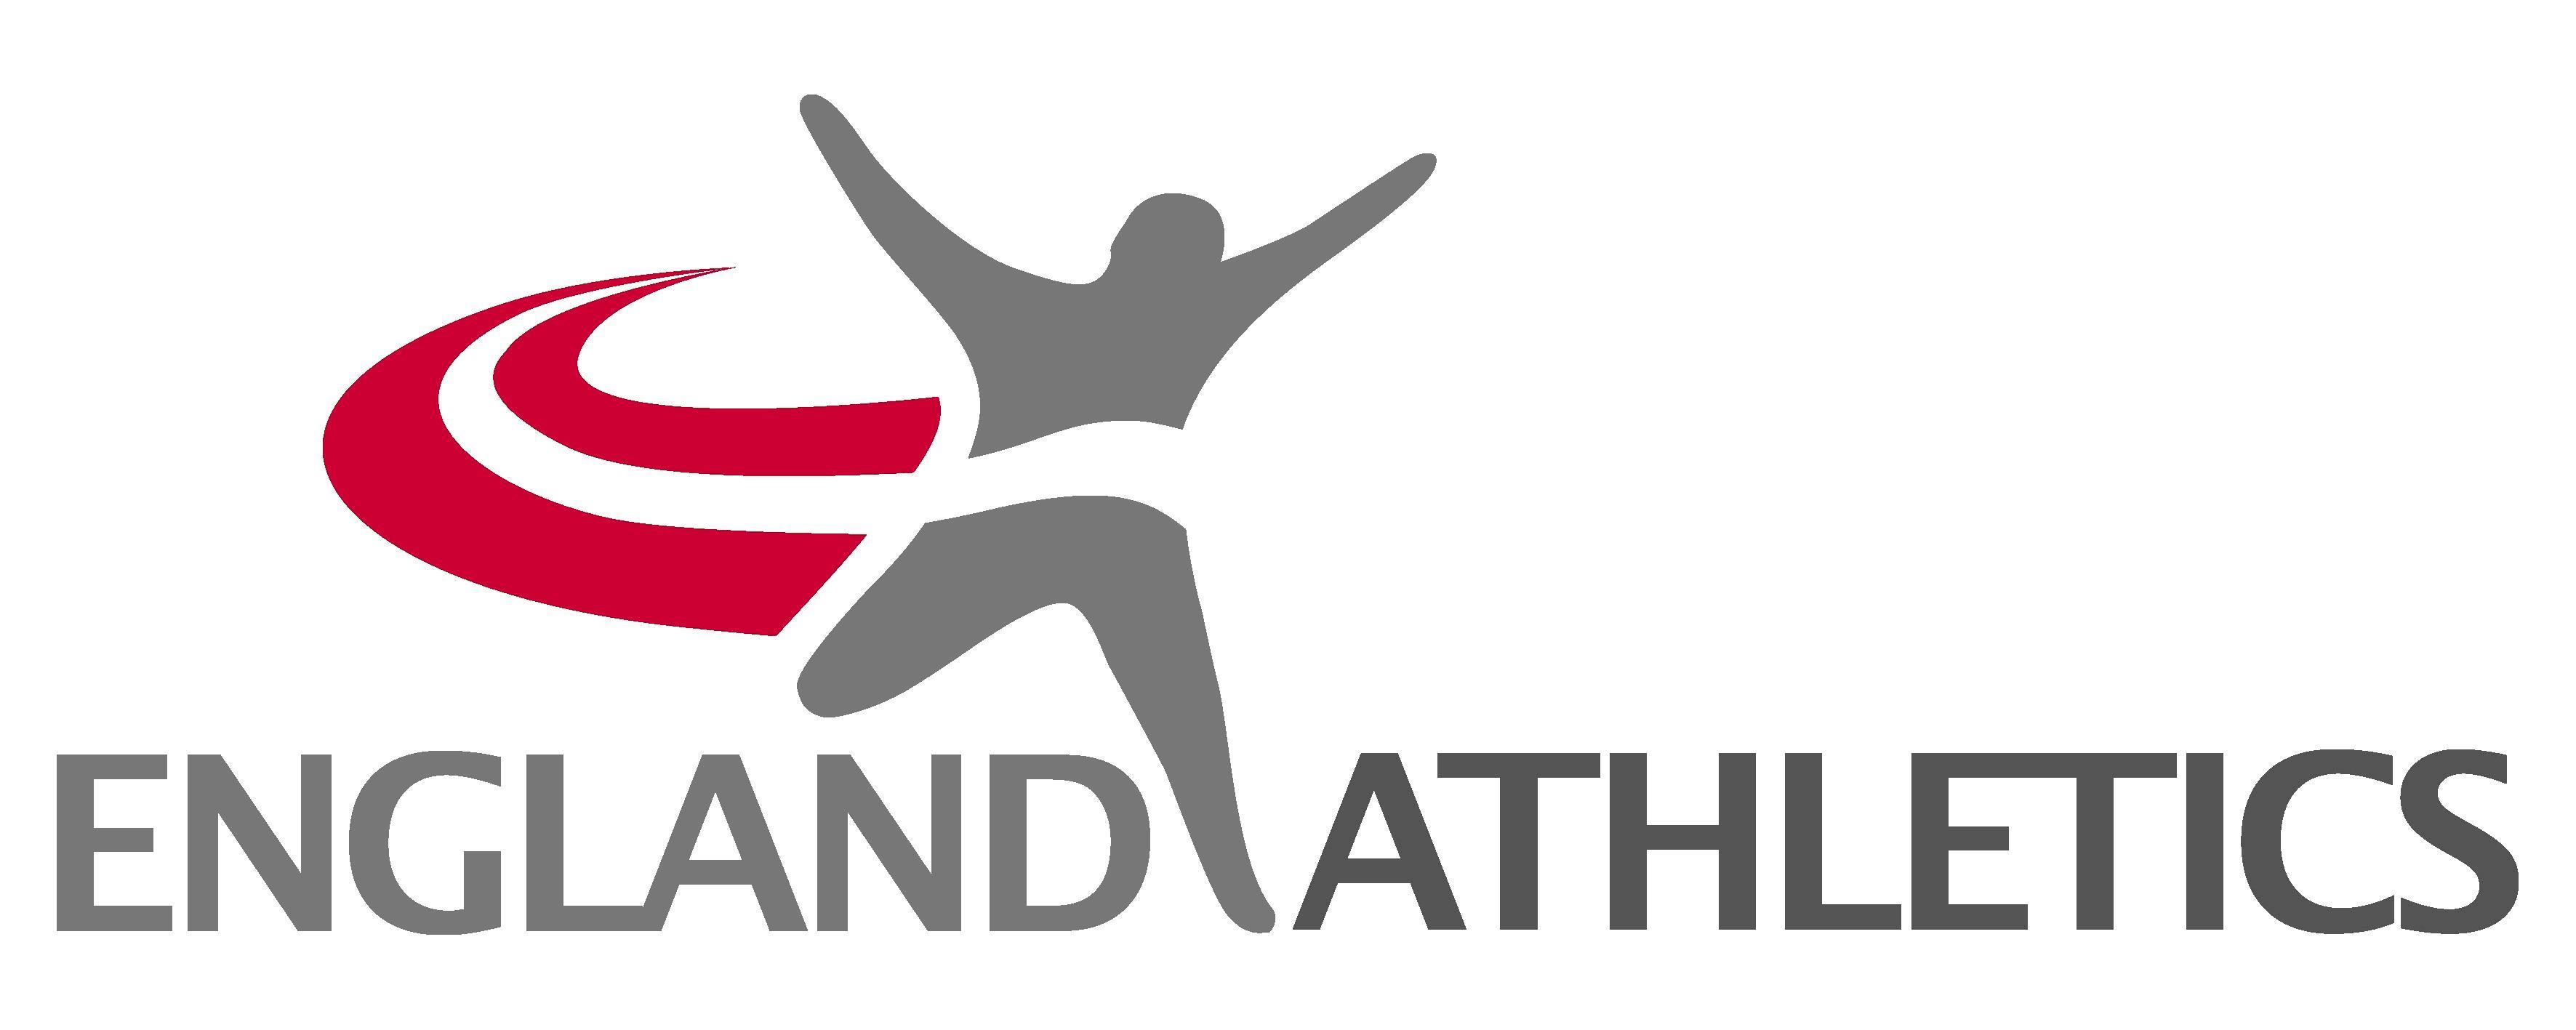 England Athletics Club Survey 2019